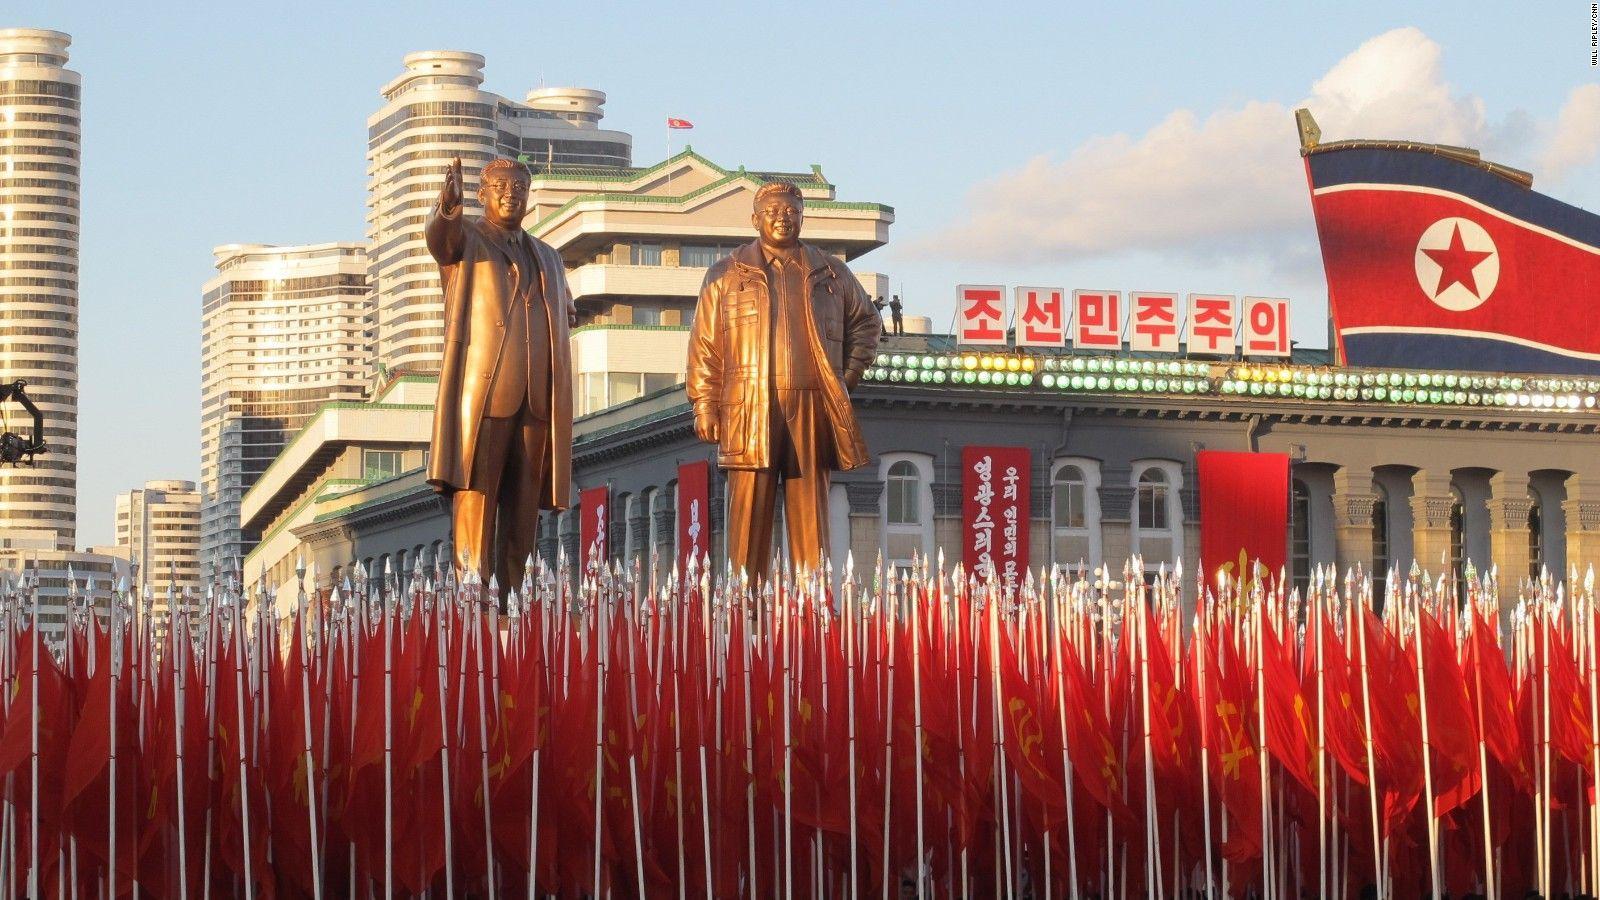 weekly vide north korea - HD1600×900